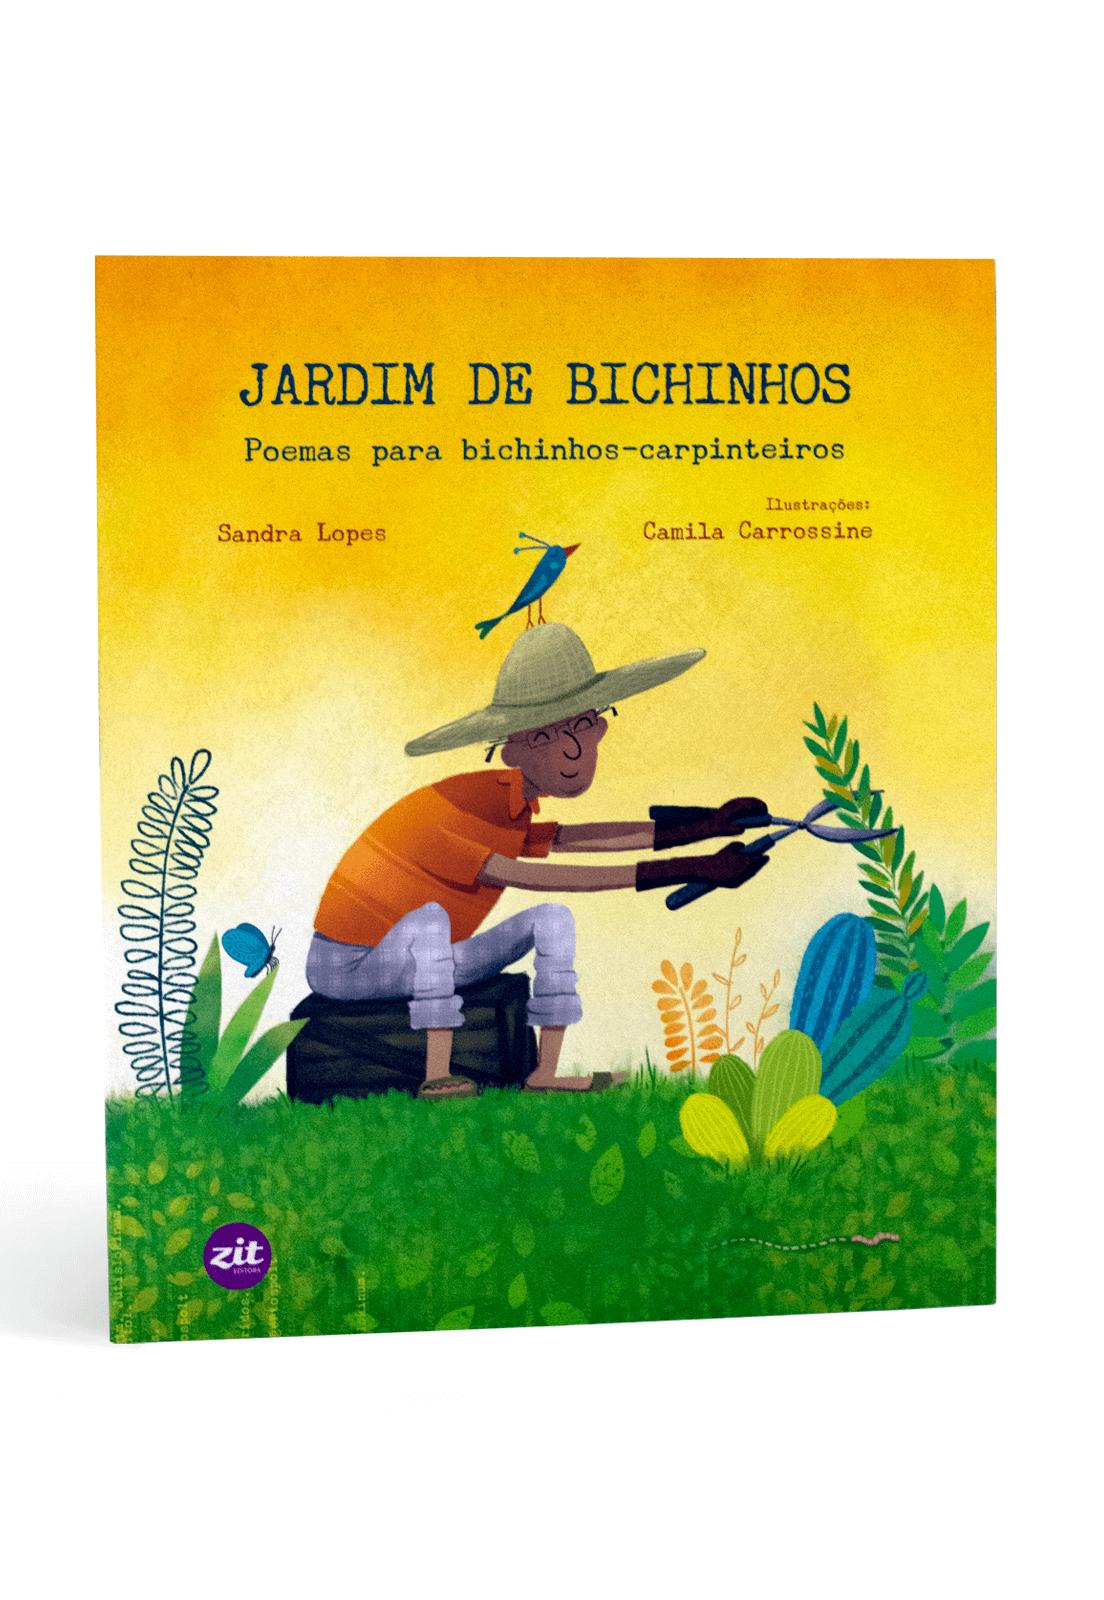 jardim-de-bichinhos-poemas-para-bichinhos-carpinteiros